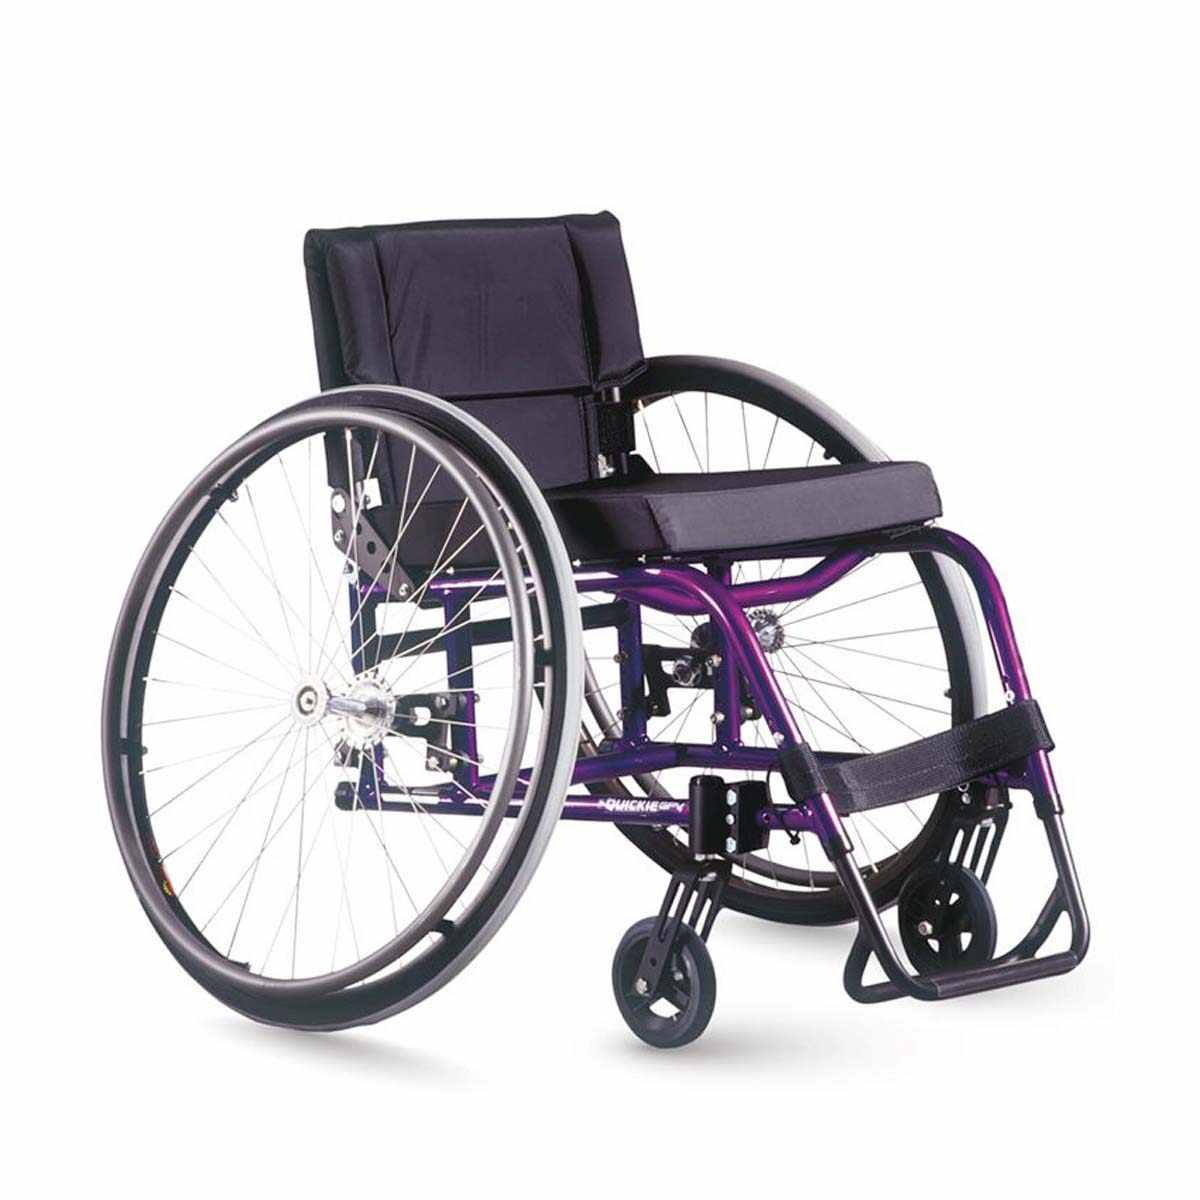 Quickie GP/GPV ultralight manual wheelchairs